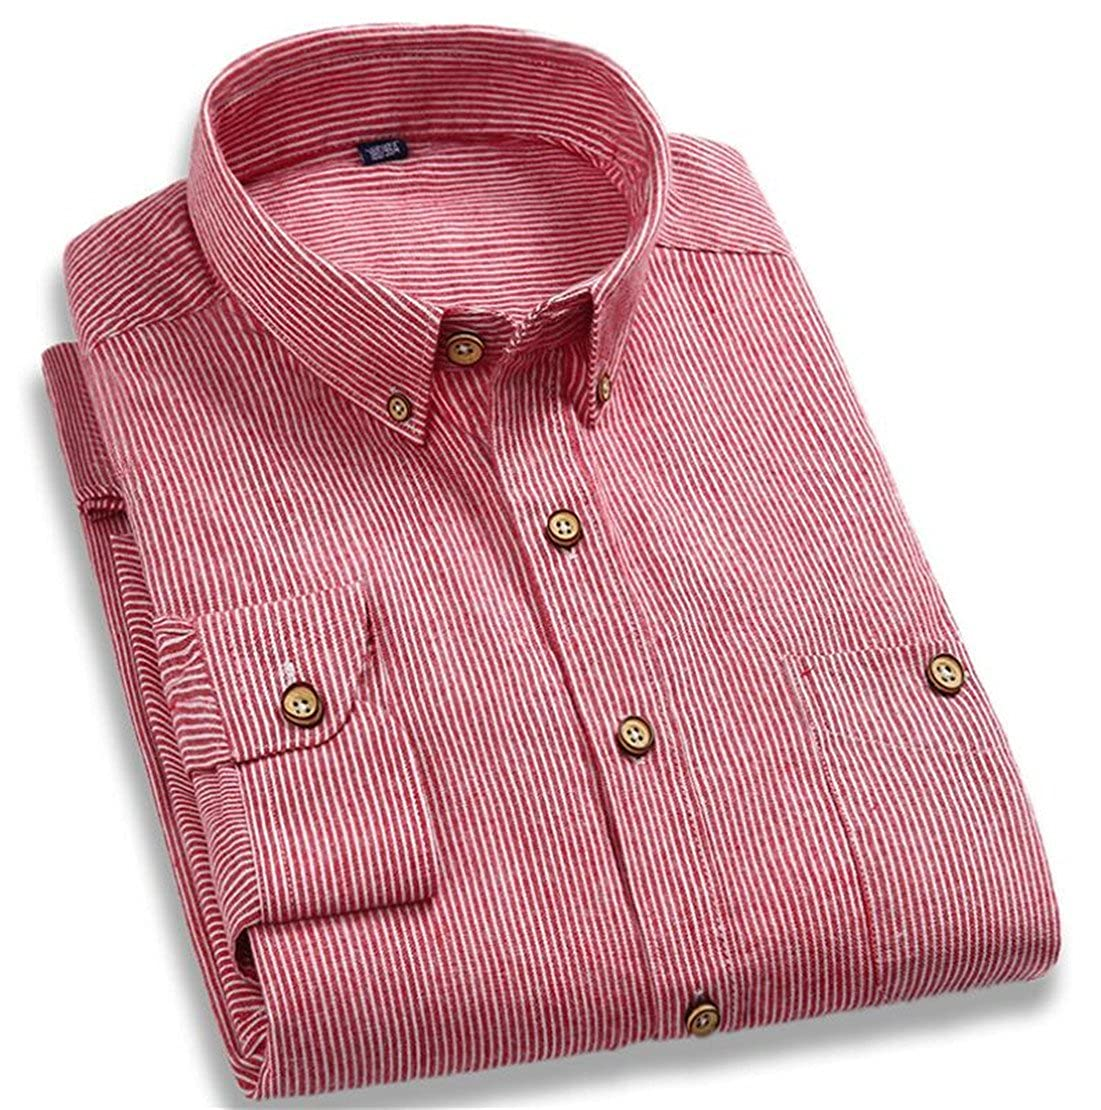 Domple Men Stylish Striped Lapel Button Down Cotton Casual Business Shirts